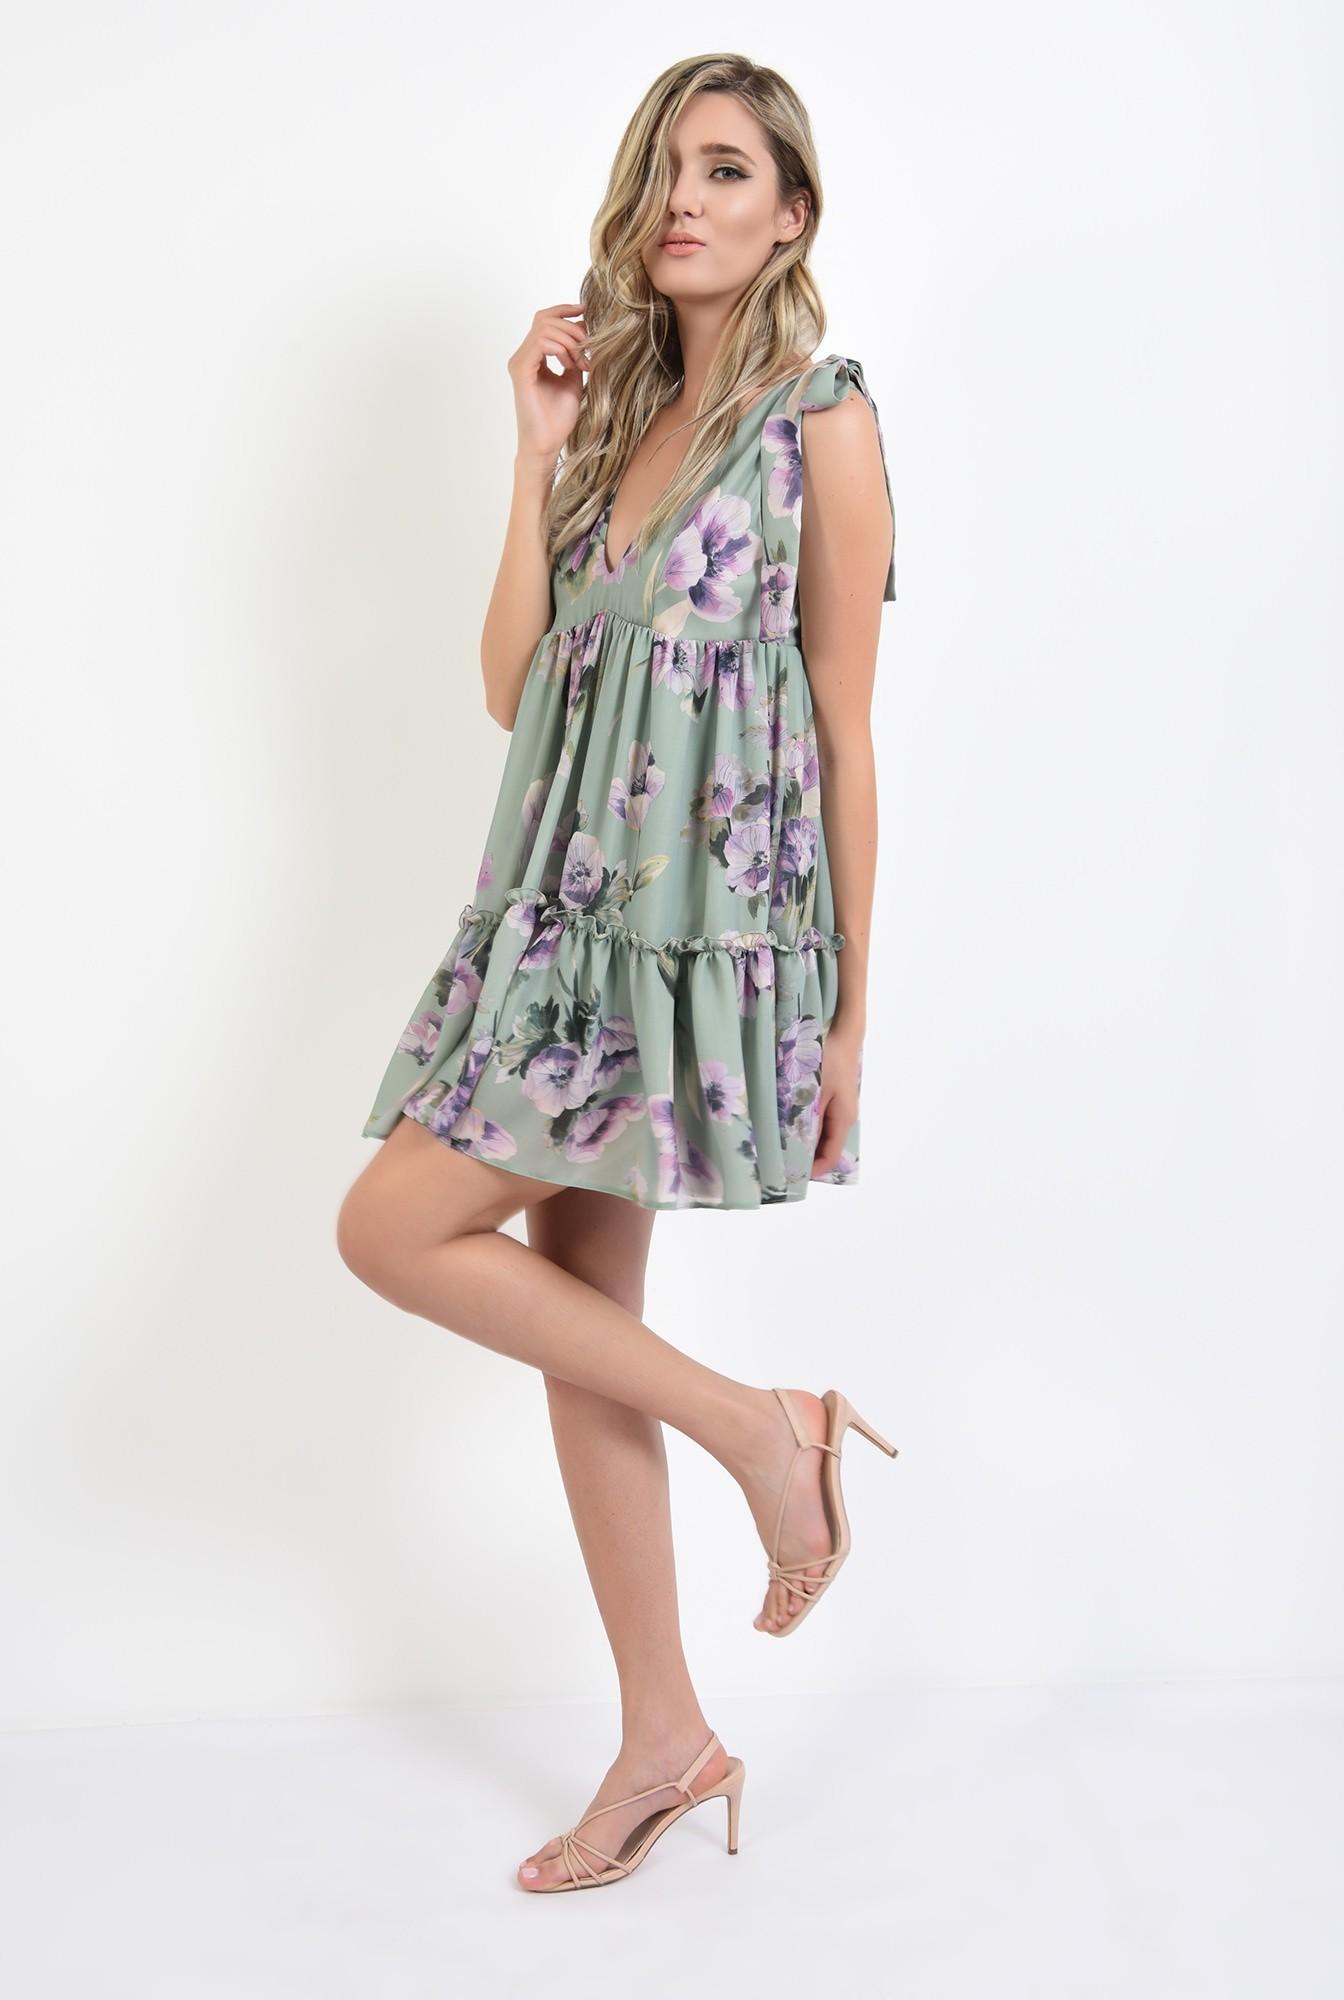 0 - 360 - rochie mini, larga, cu flori, Poema